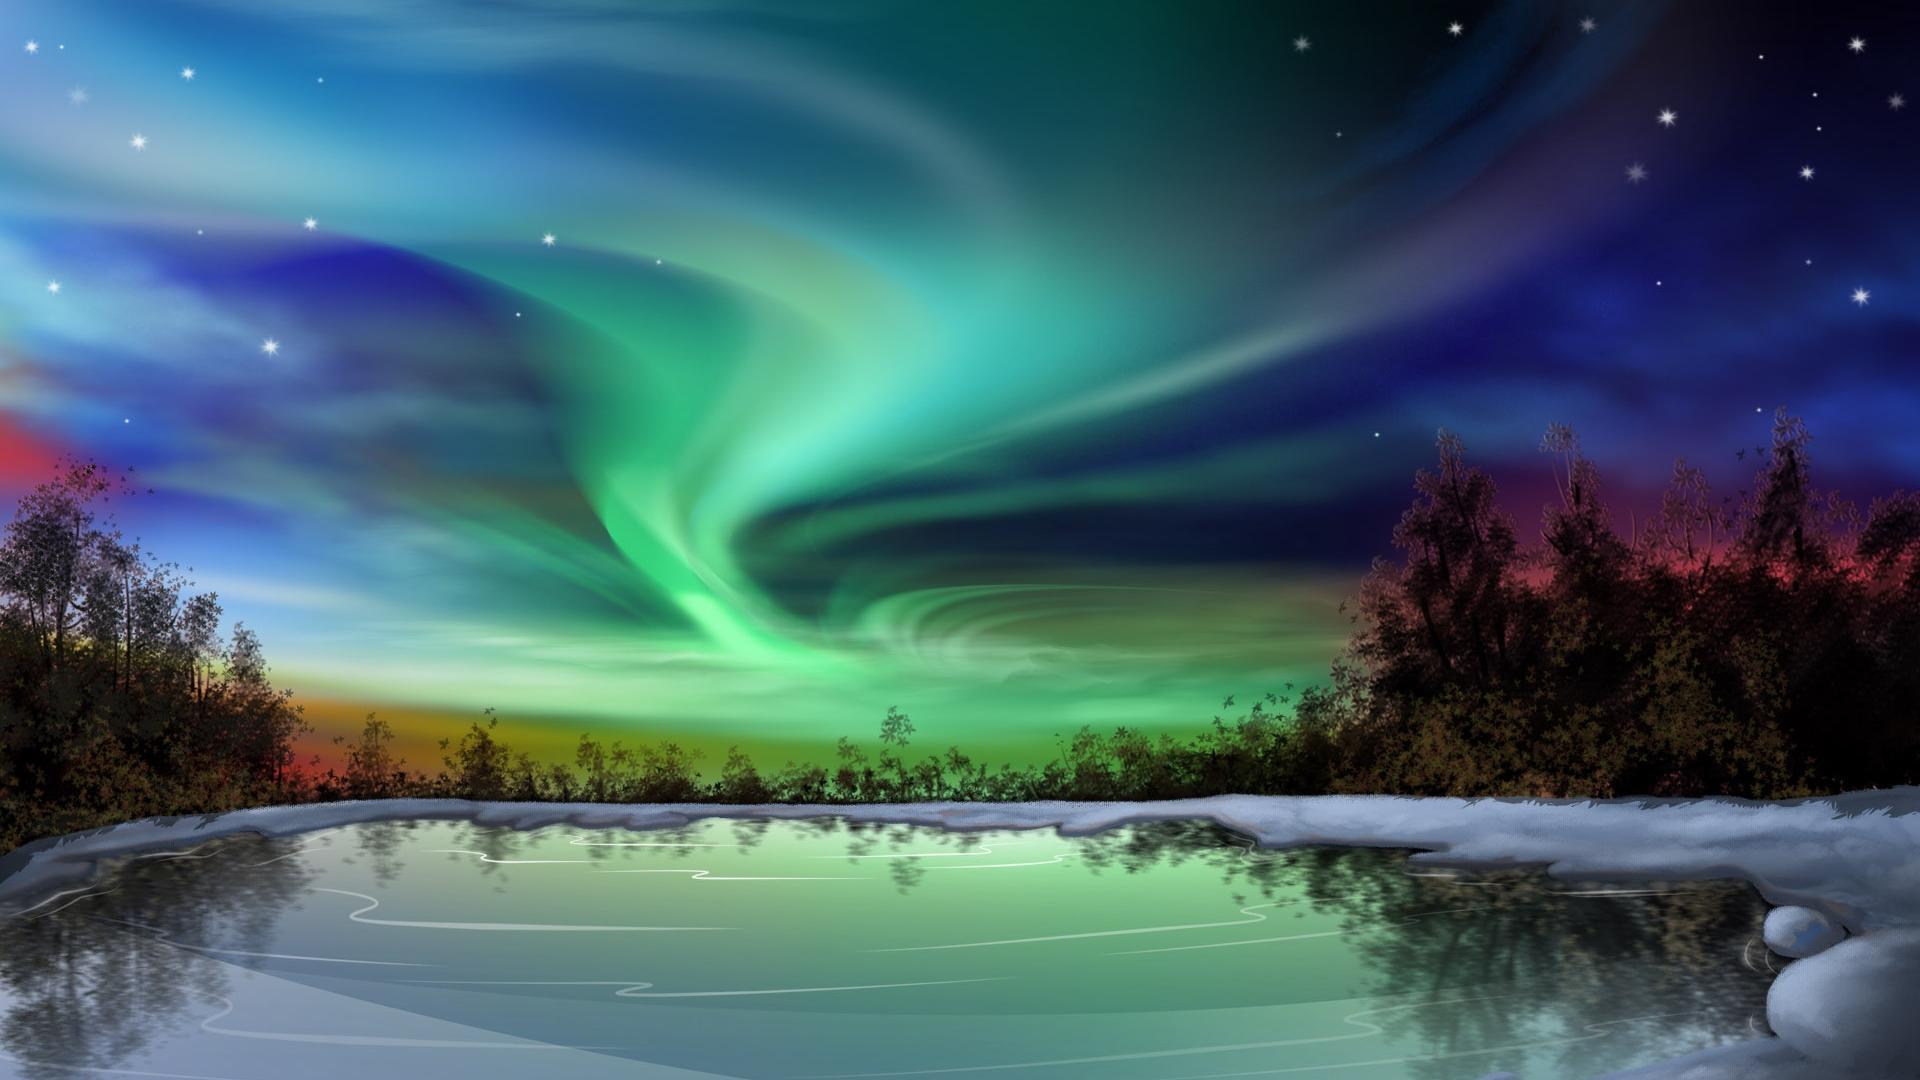 Northern Lights wallpaper - 401196